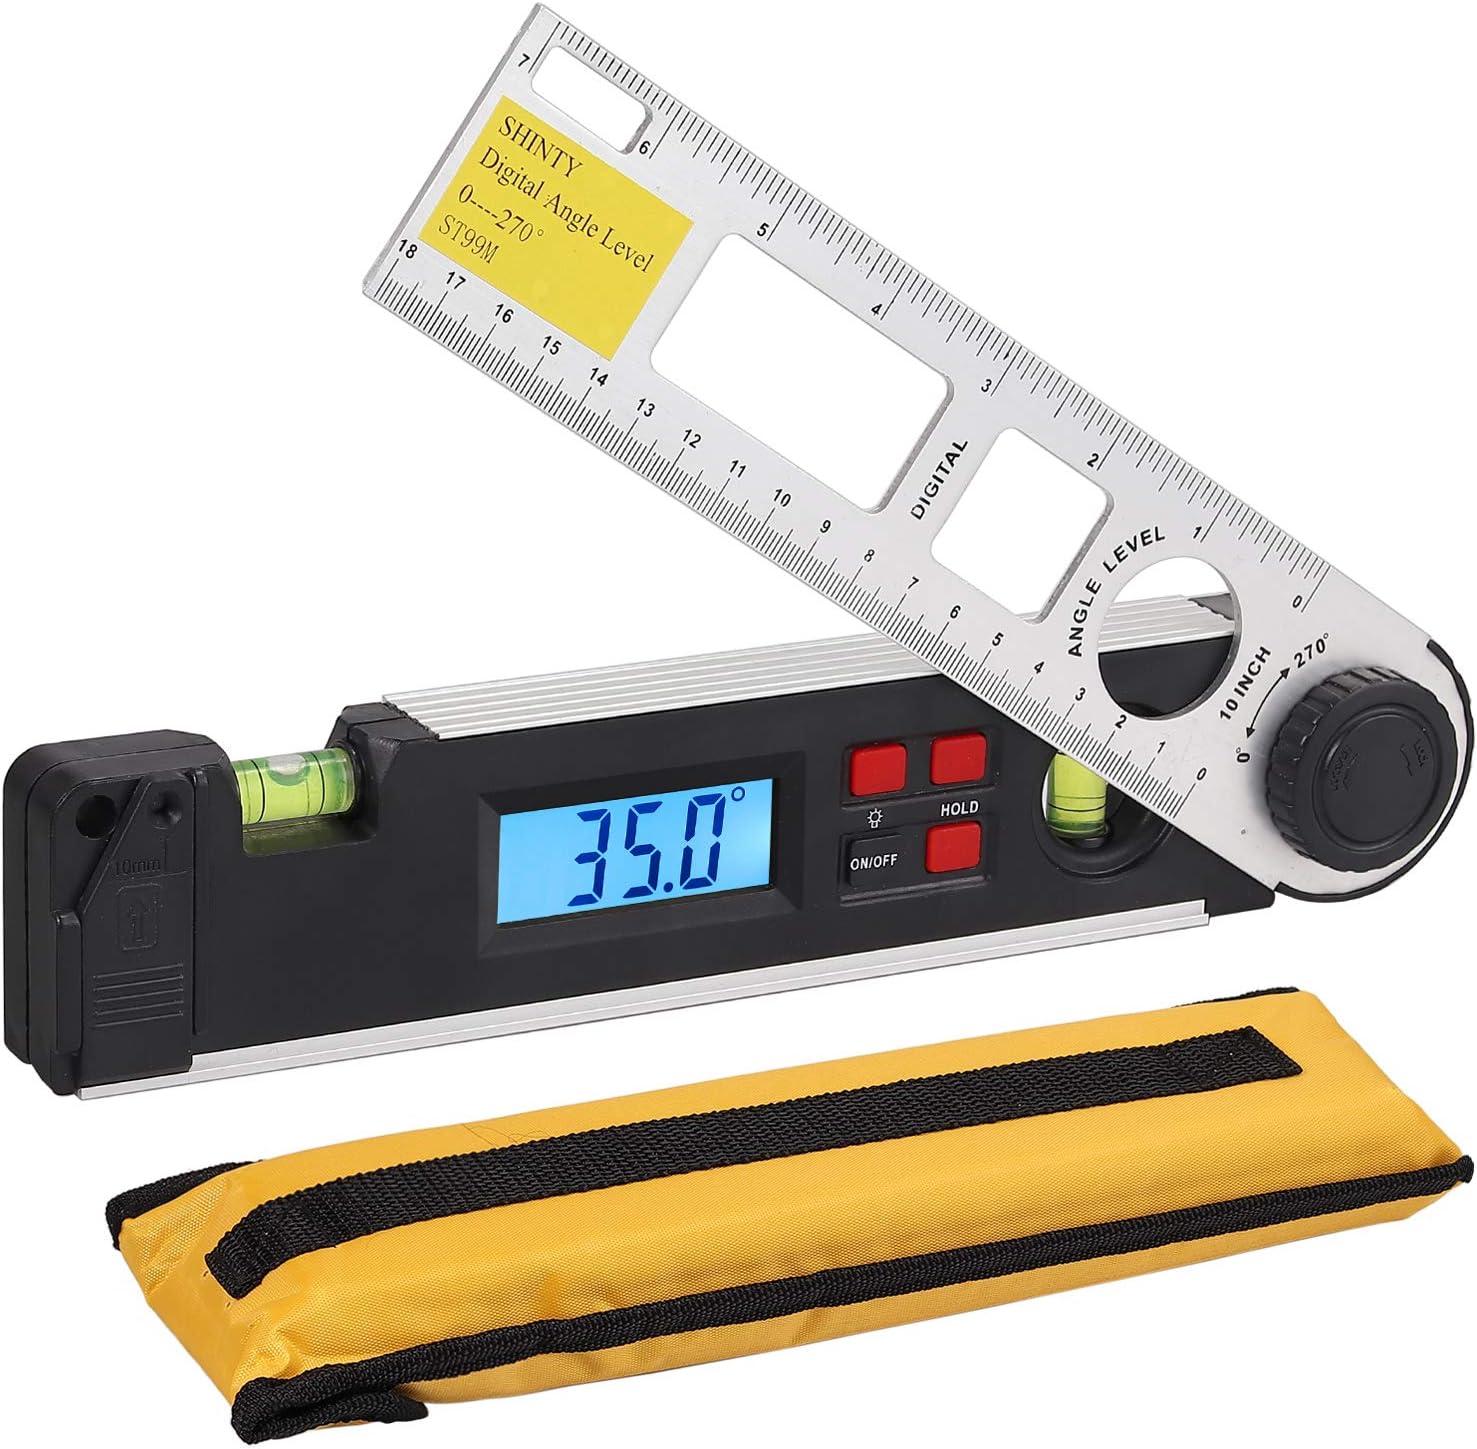 Digital Inclinometer Spirit Level Box Protractor Horizontal Angle Measuring New